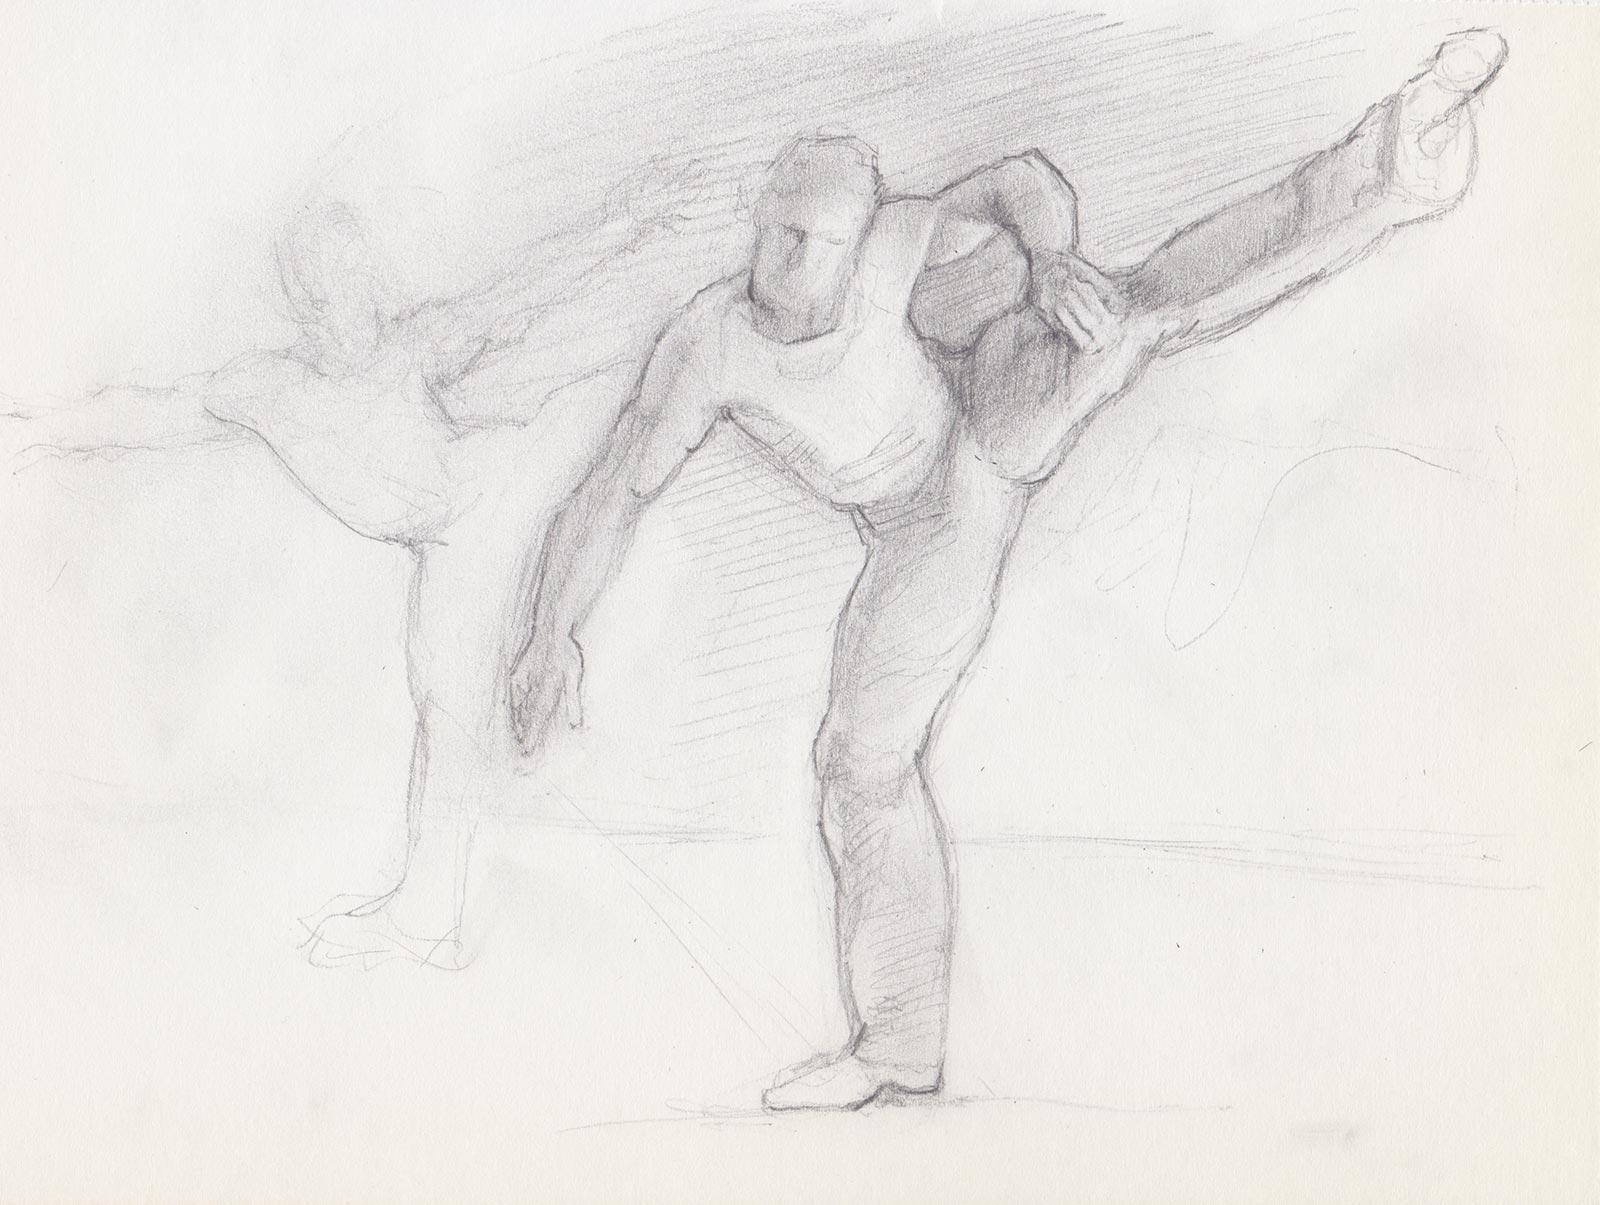 Gesture Sketch of Dancer by Marie Frances